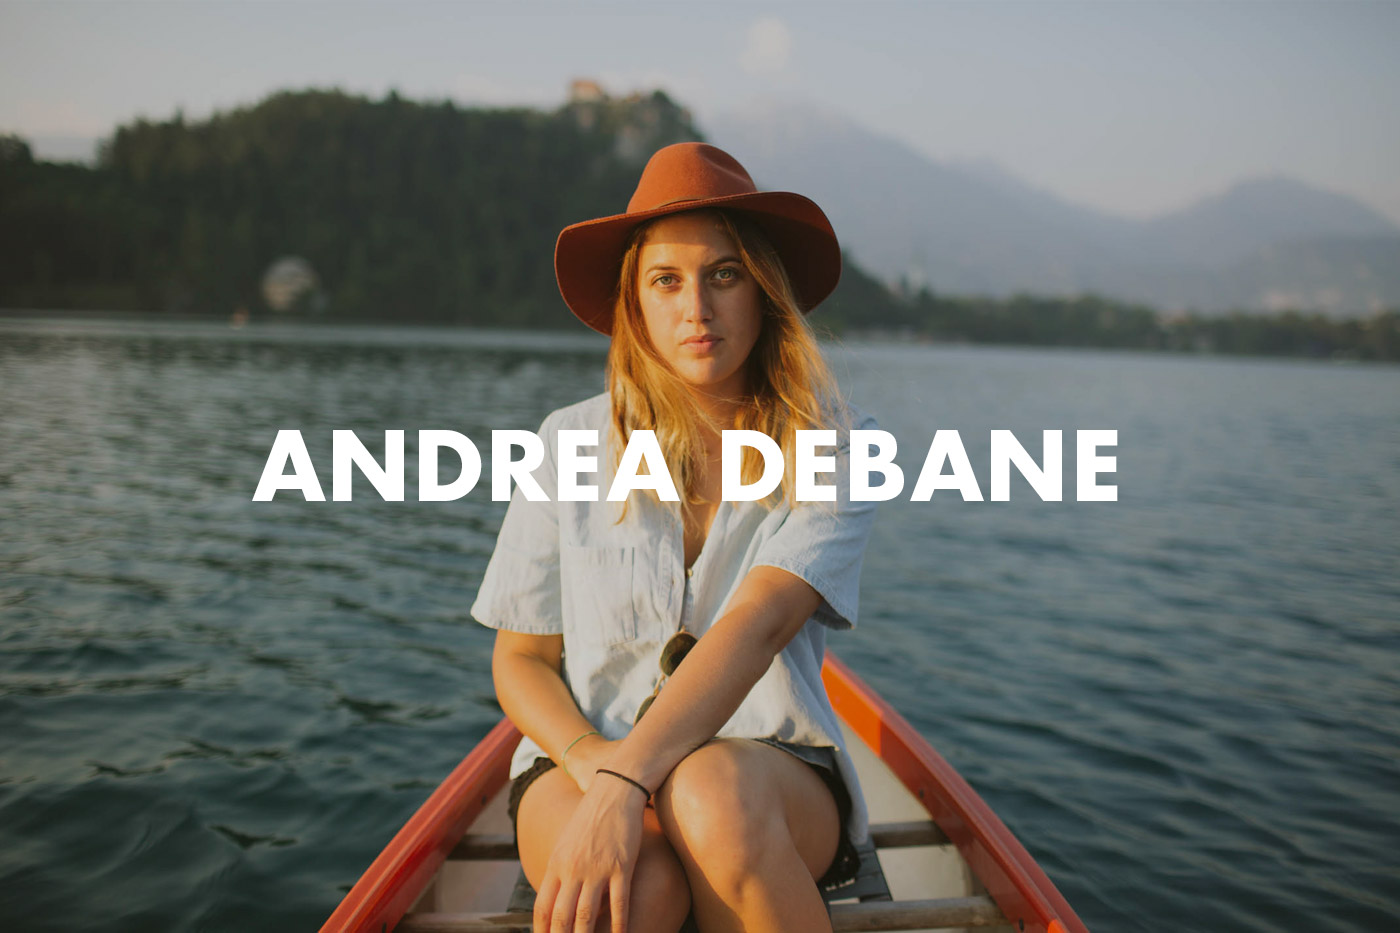 Andrea-Debane-Hero.jpg